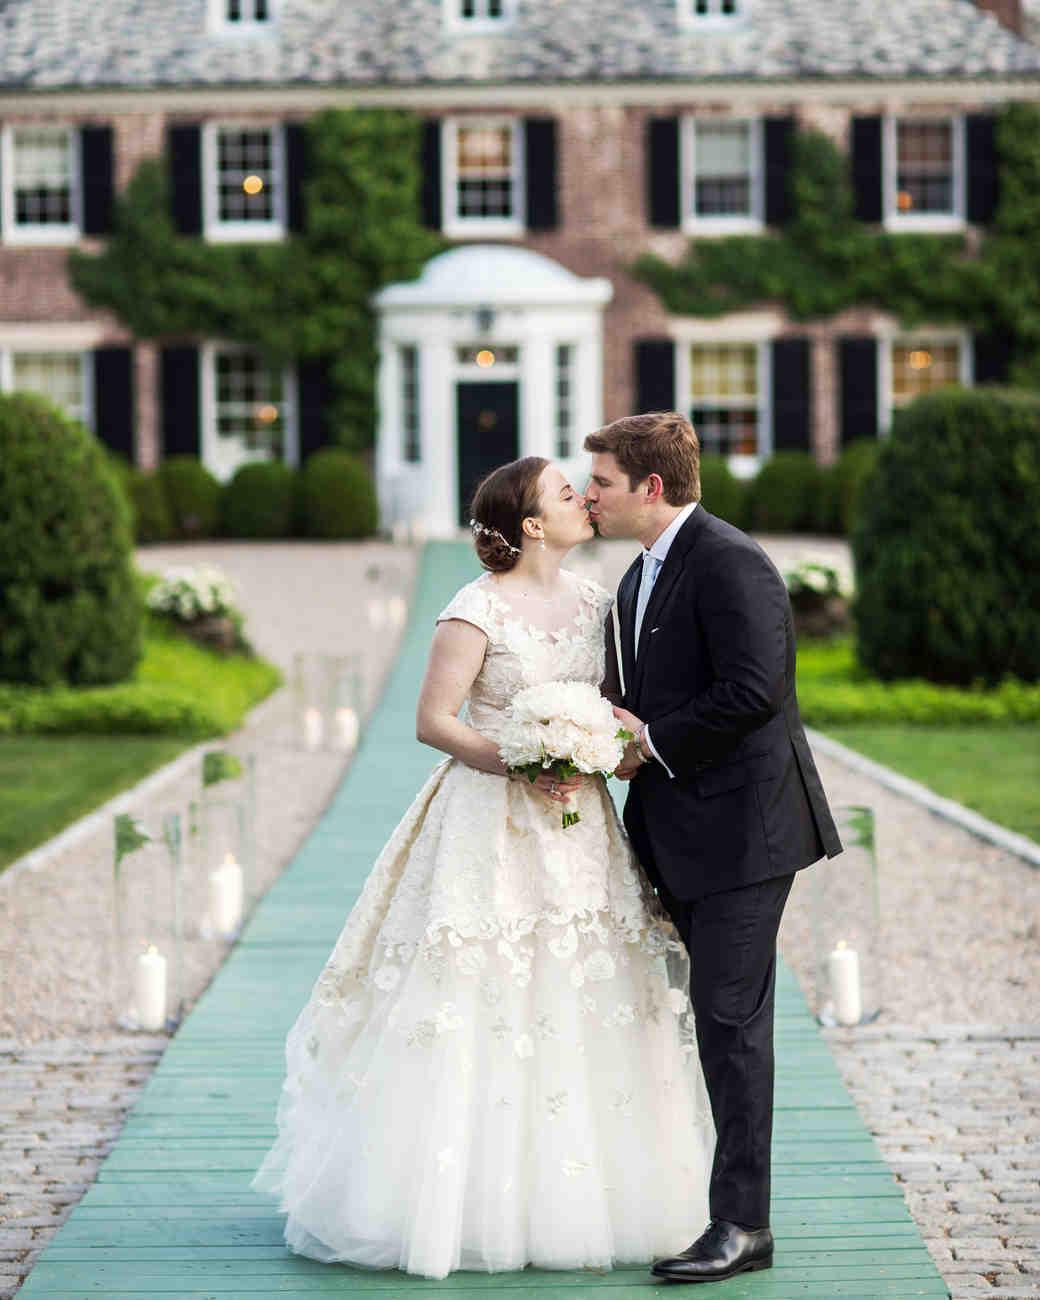 Backyard Wedding Themes: A Peony-Filled Backyard Wedding In New Jersey